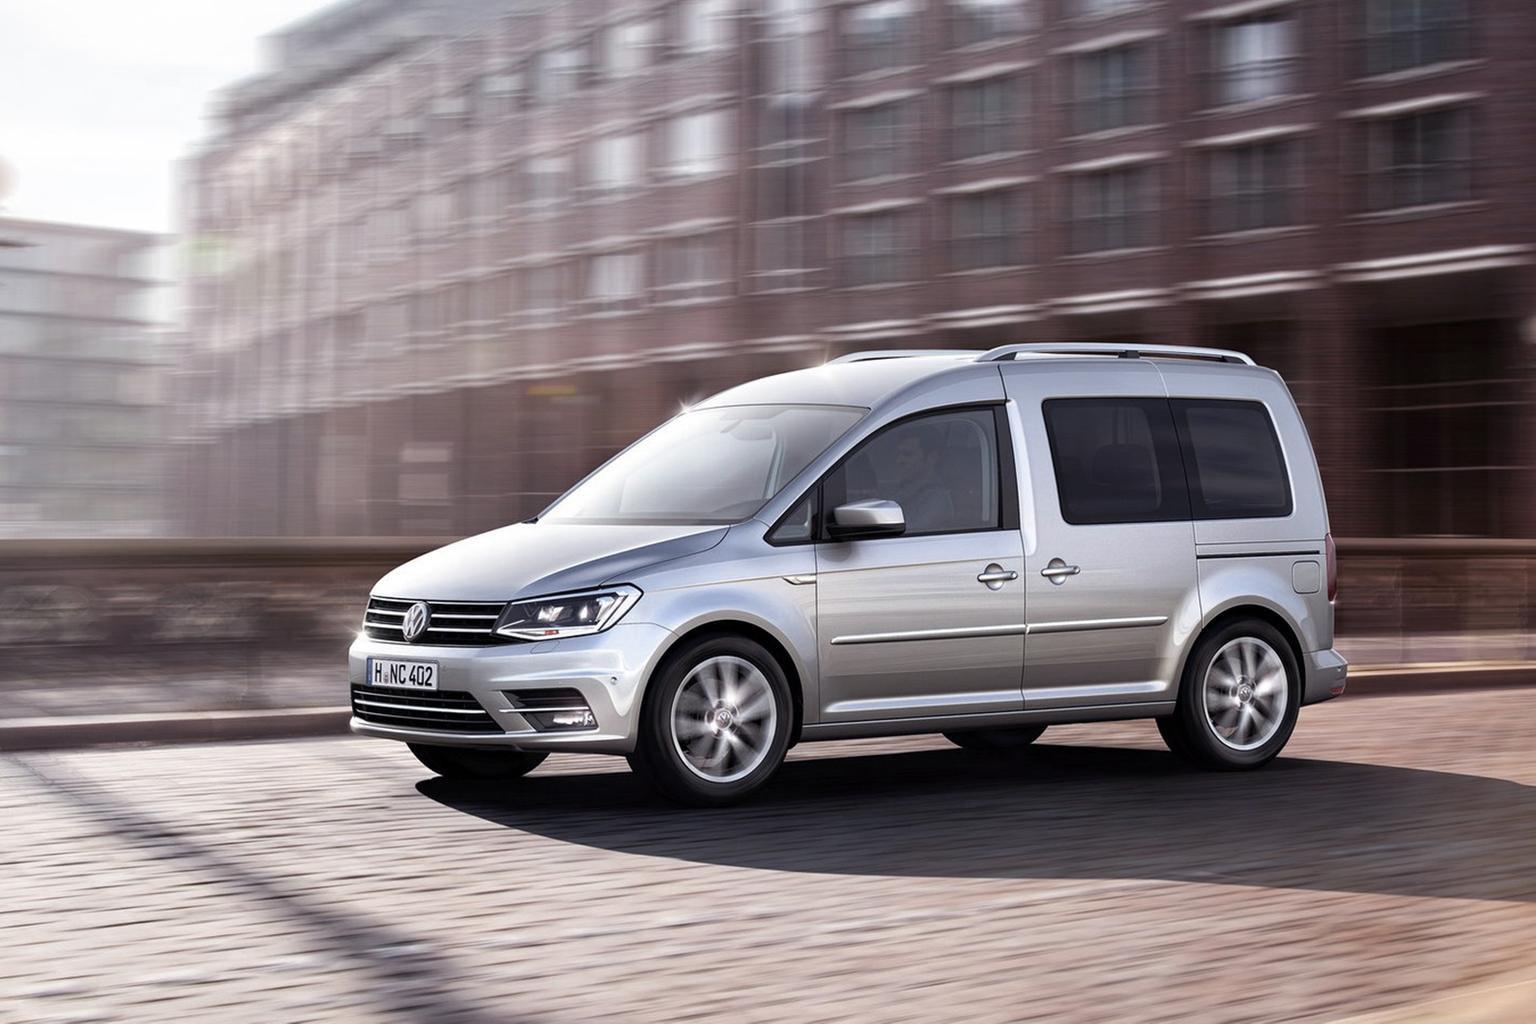 2015 Volkswagen Caddy Life 2.0 TDI review